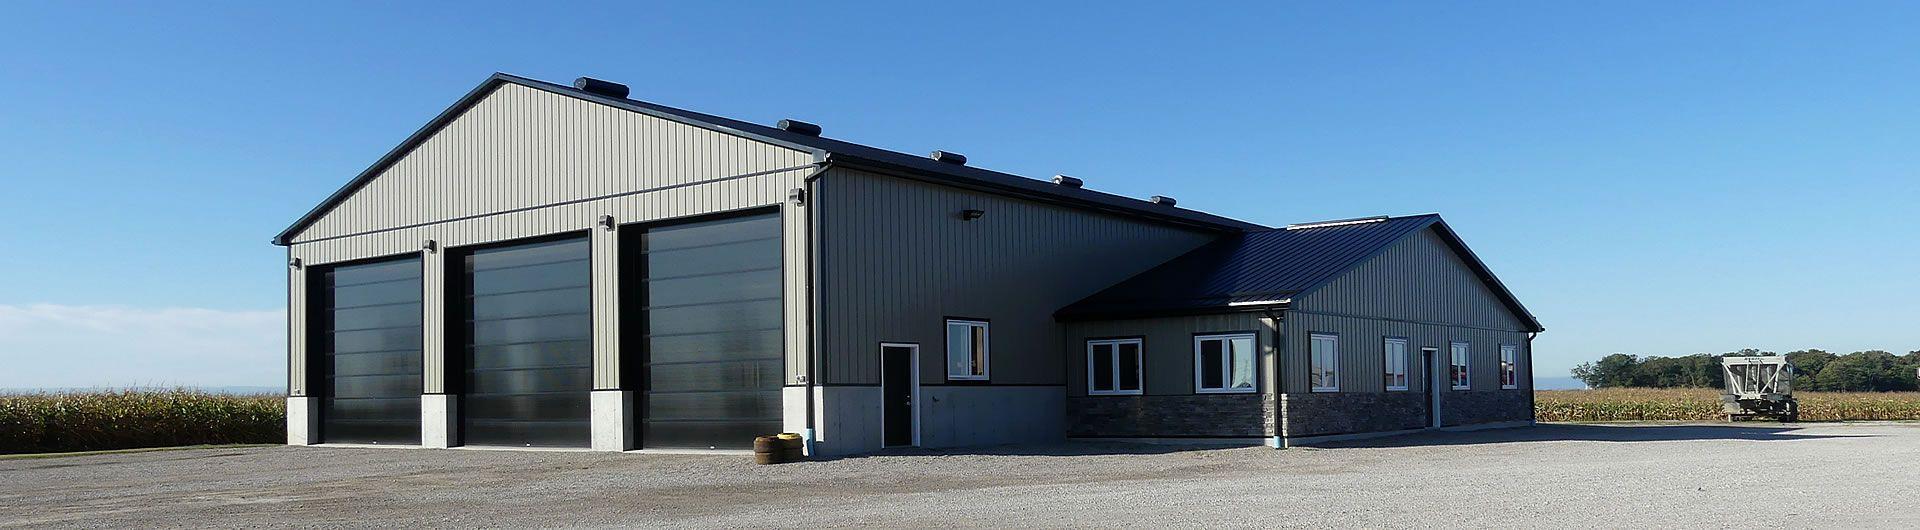 Farm bulding with 3 overhead doors